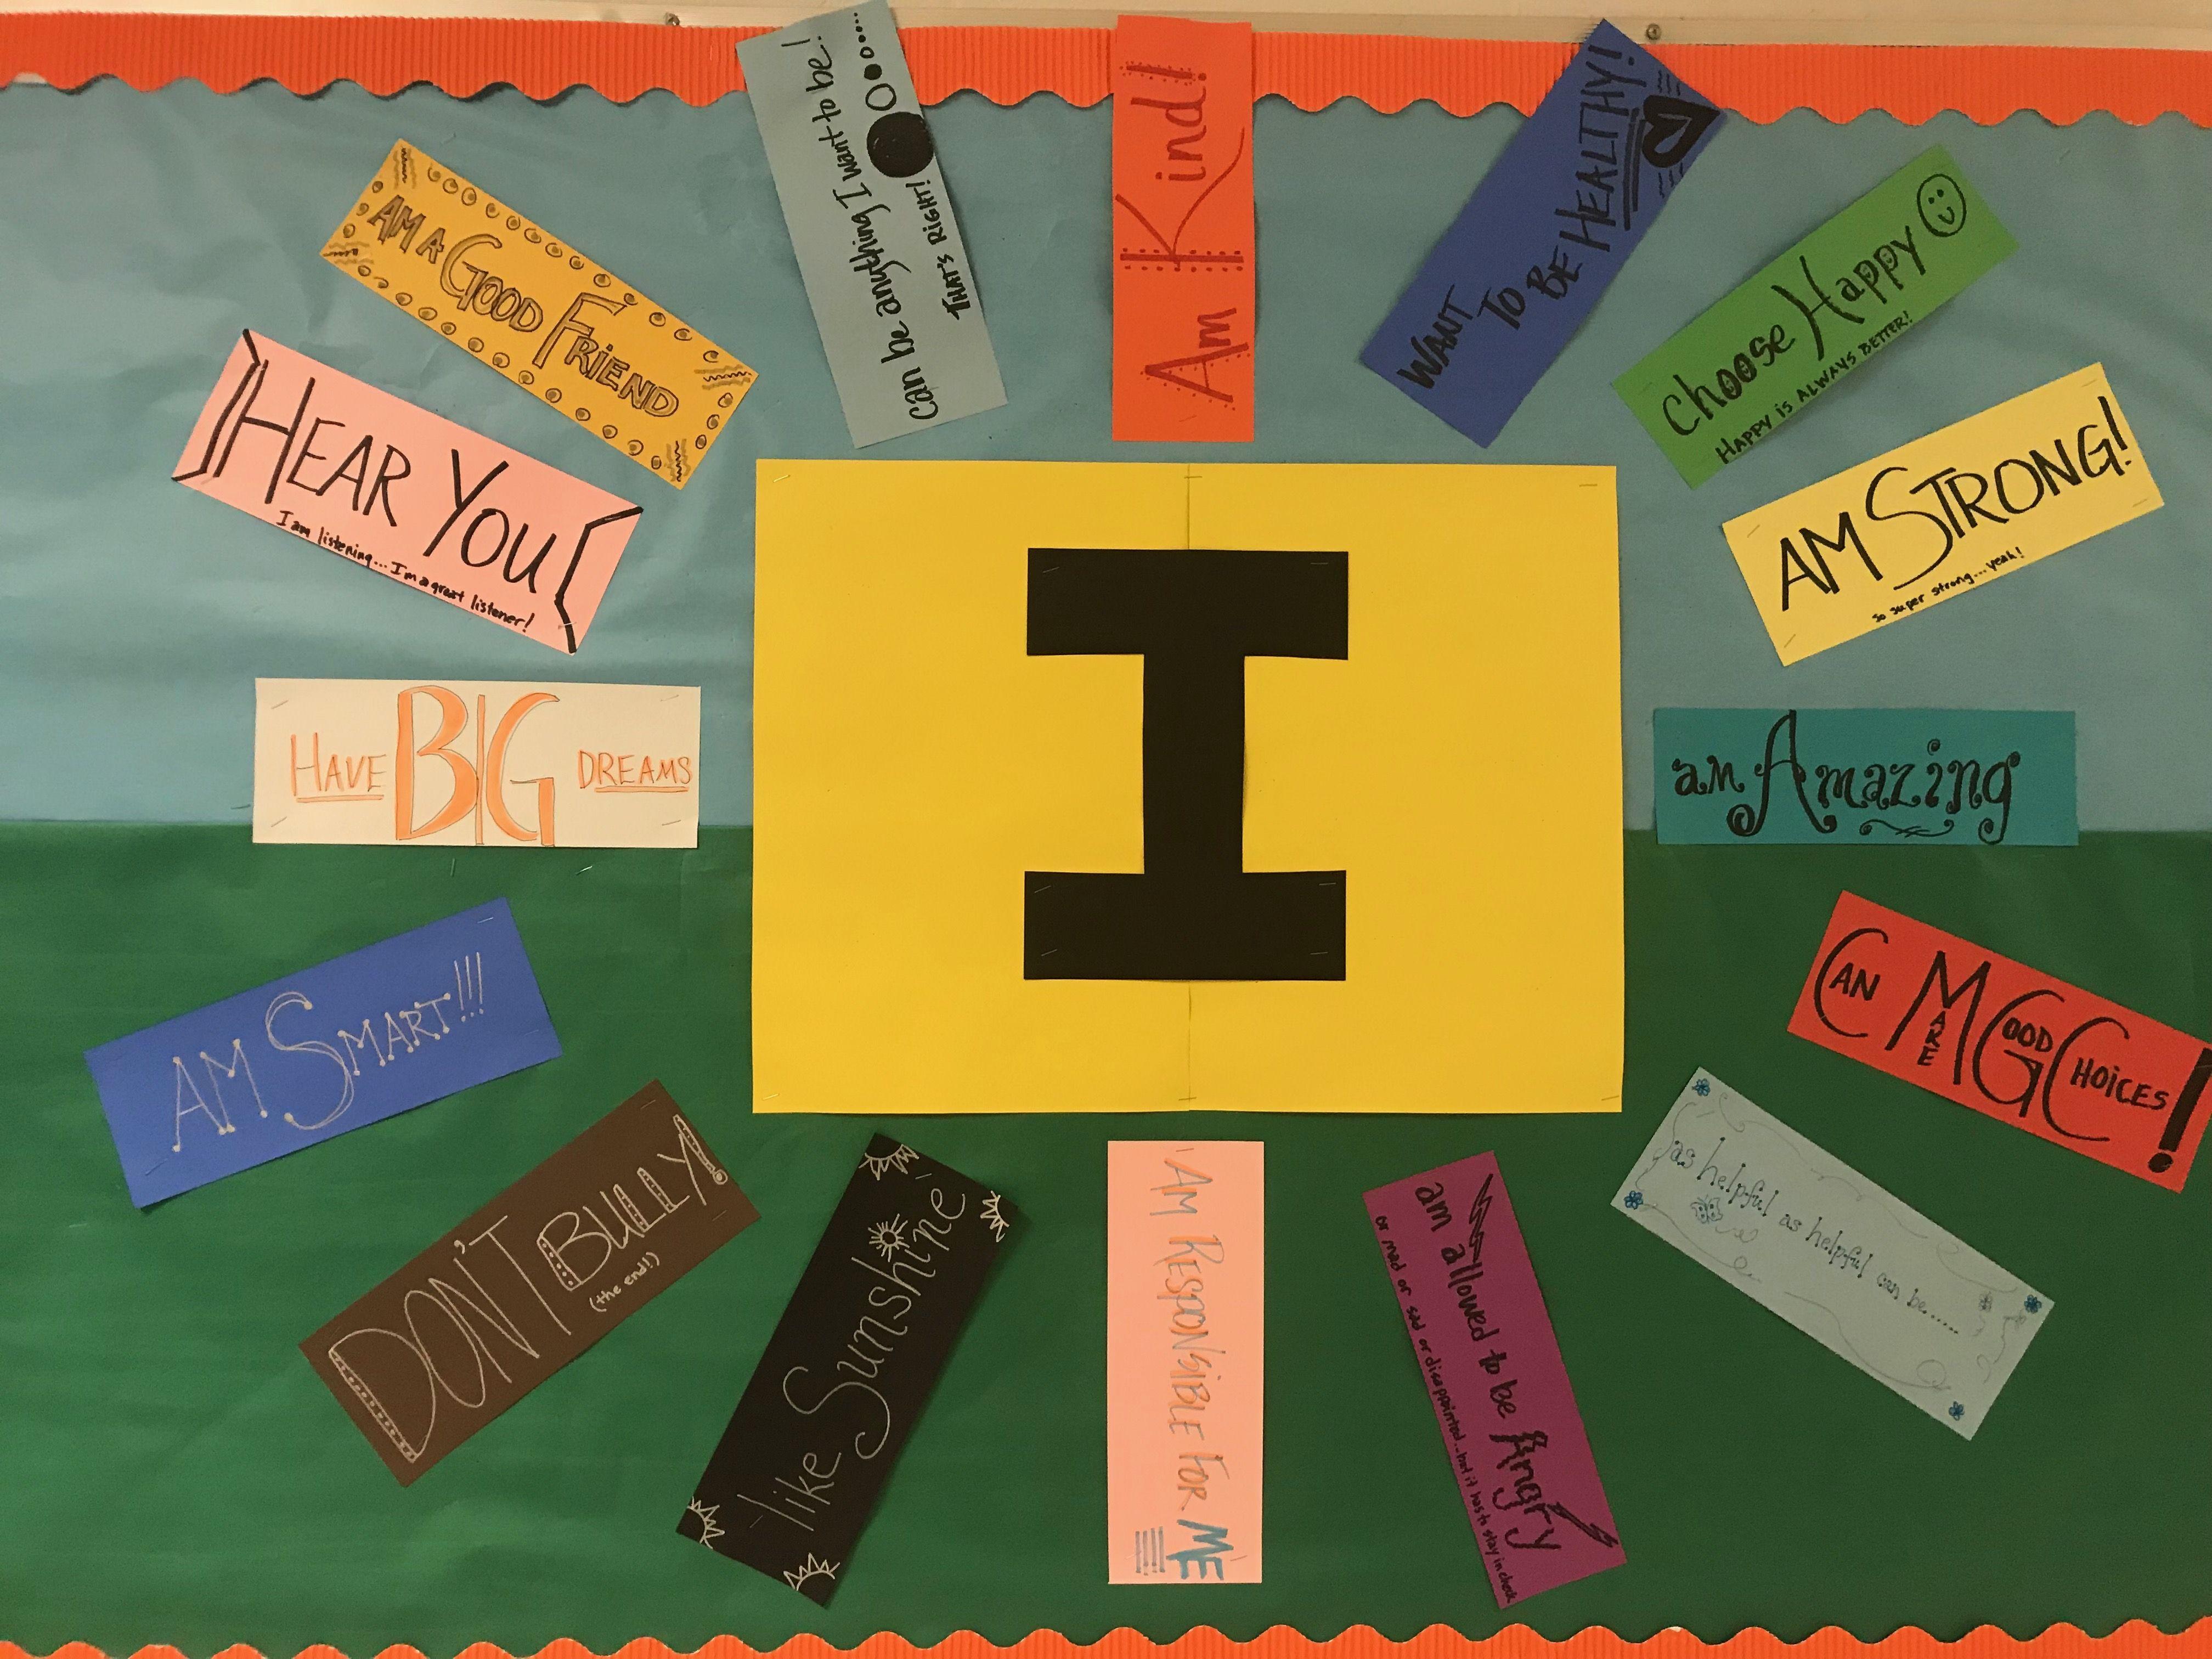 Pin by kj duggins on teacher stuff | Pinterest | Teacher stuff ...